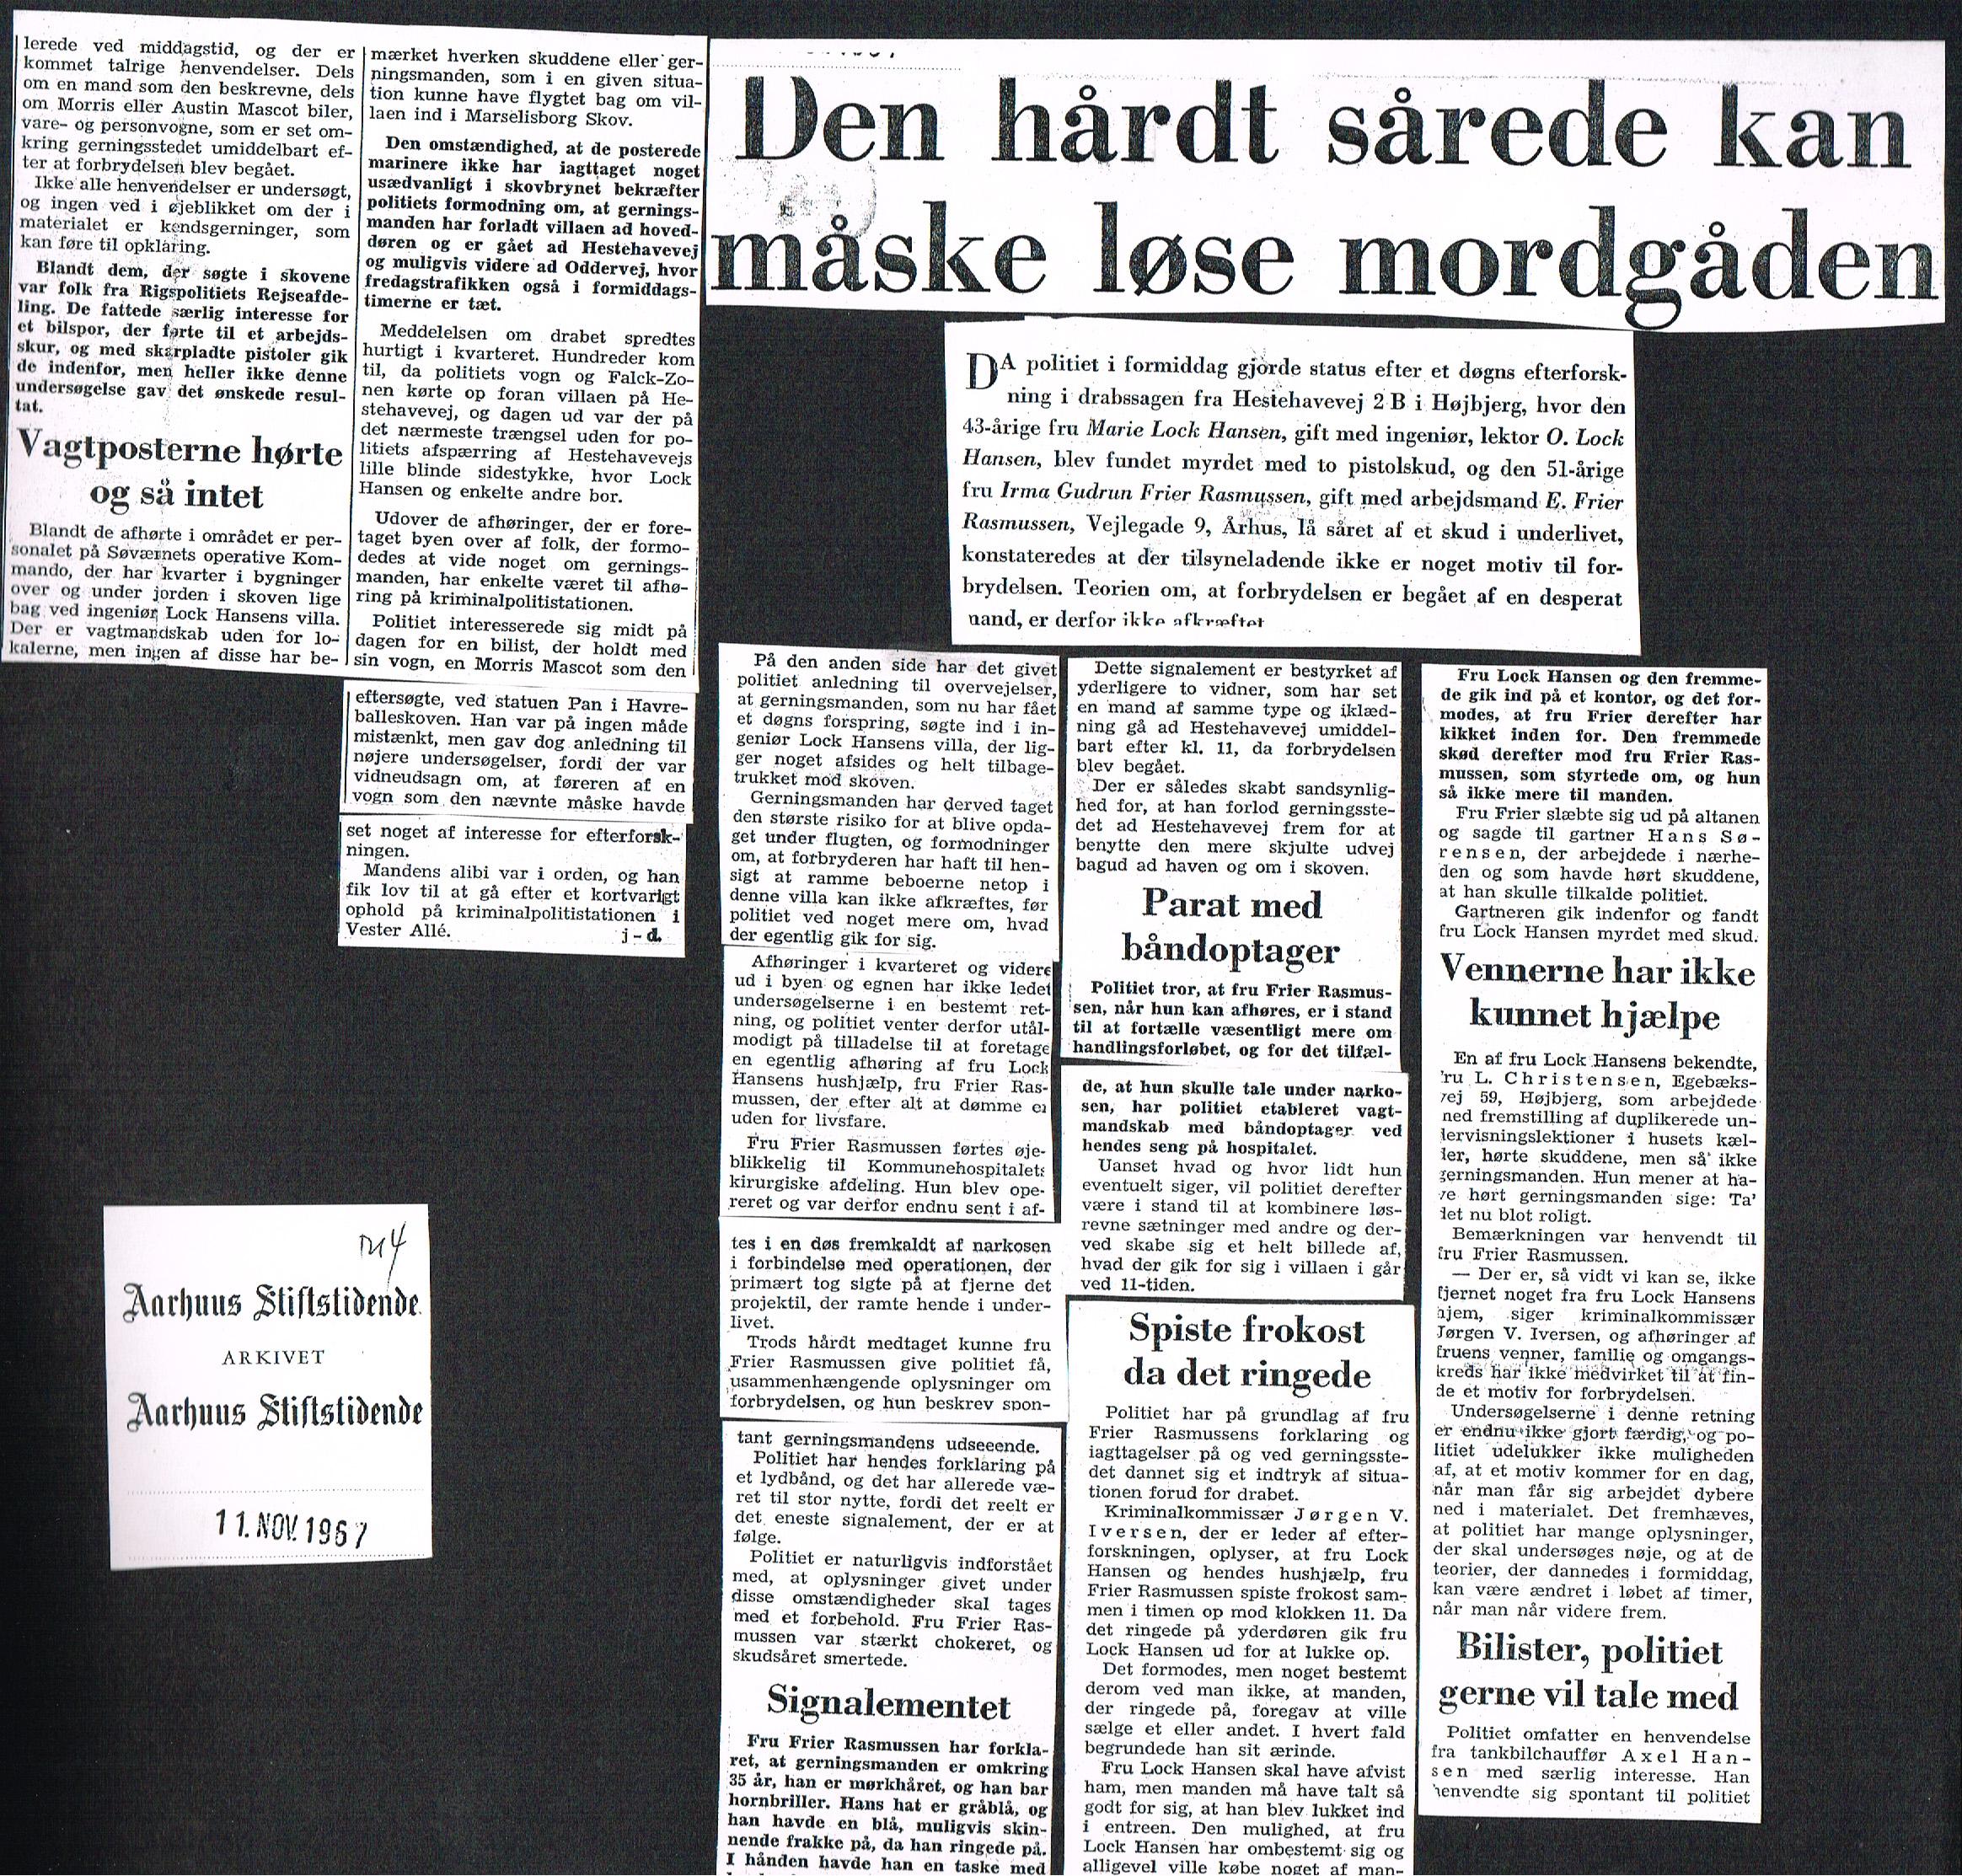 Højbjerg-drabet Aarhus Stiftstidende 11. november 1967